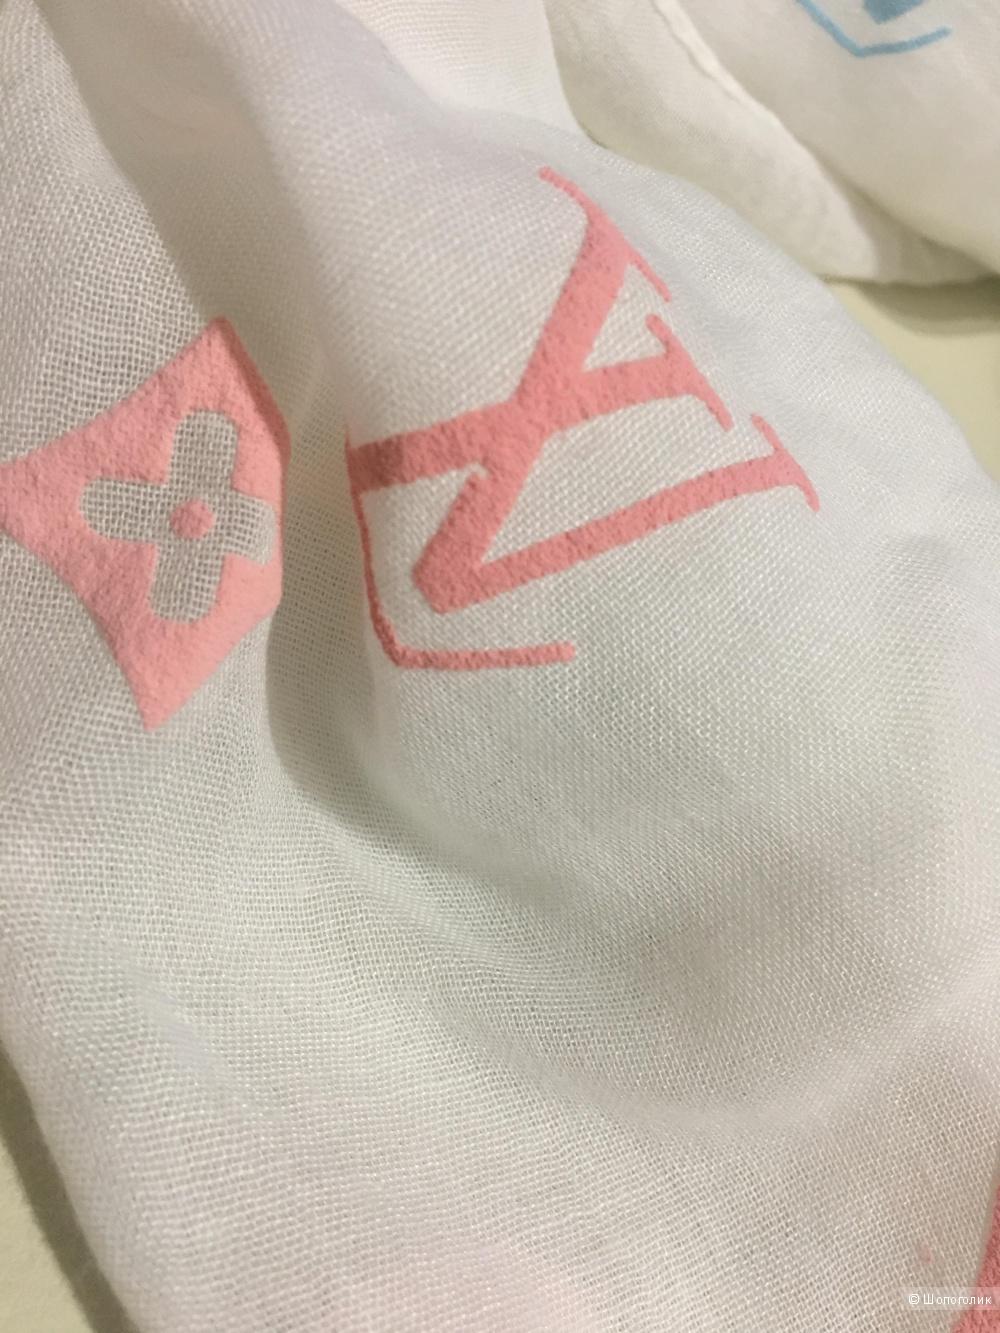 Палантин Louis Vuitton, 75*180, хлопок